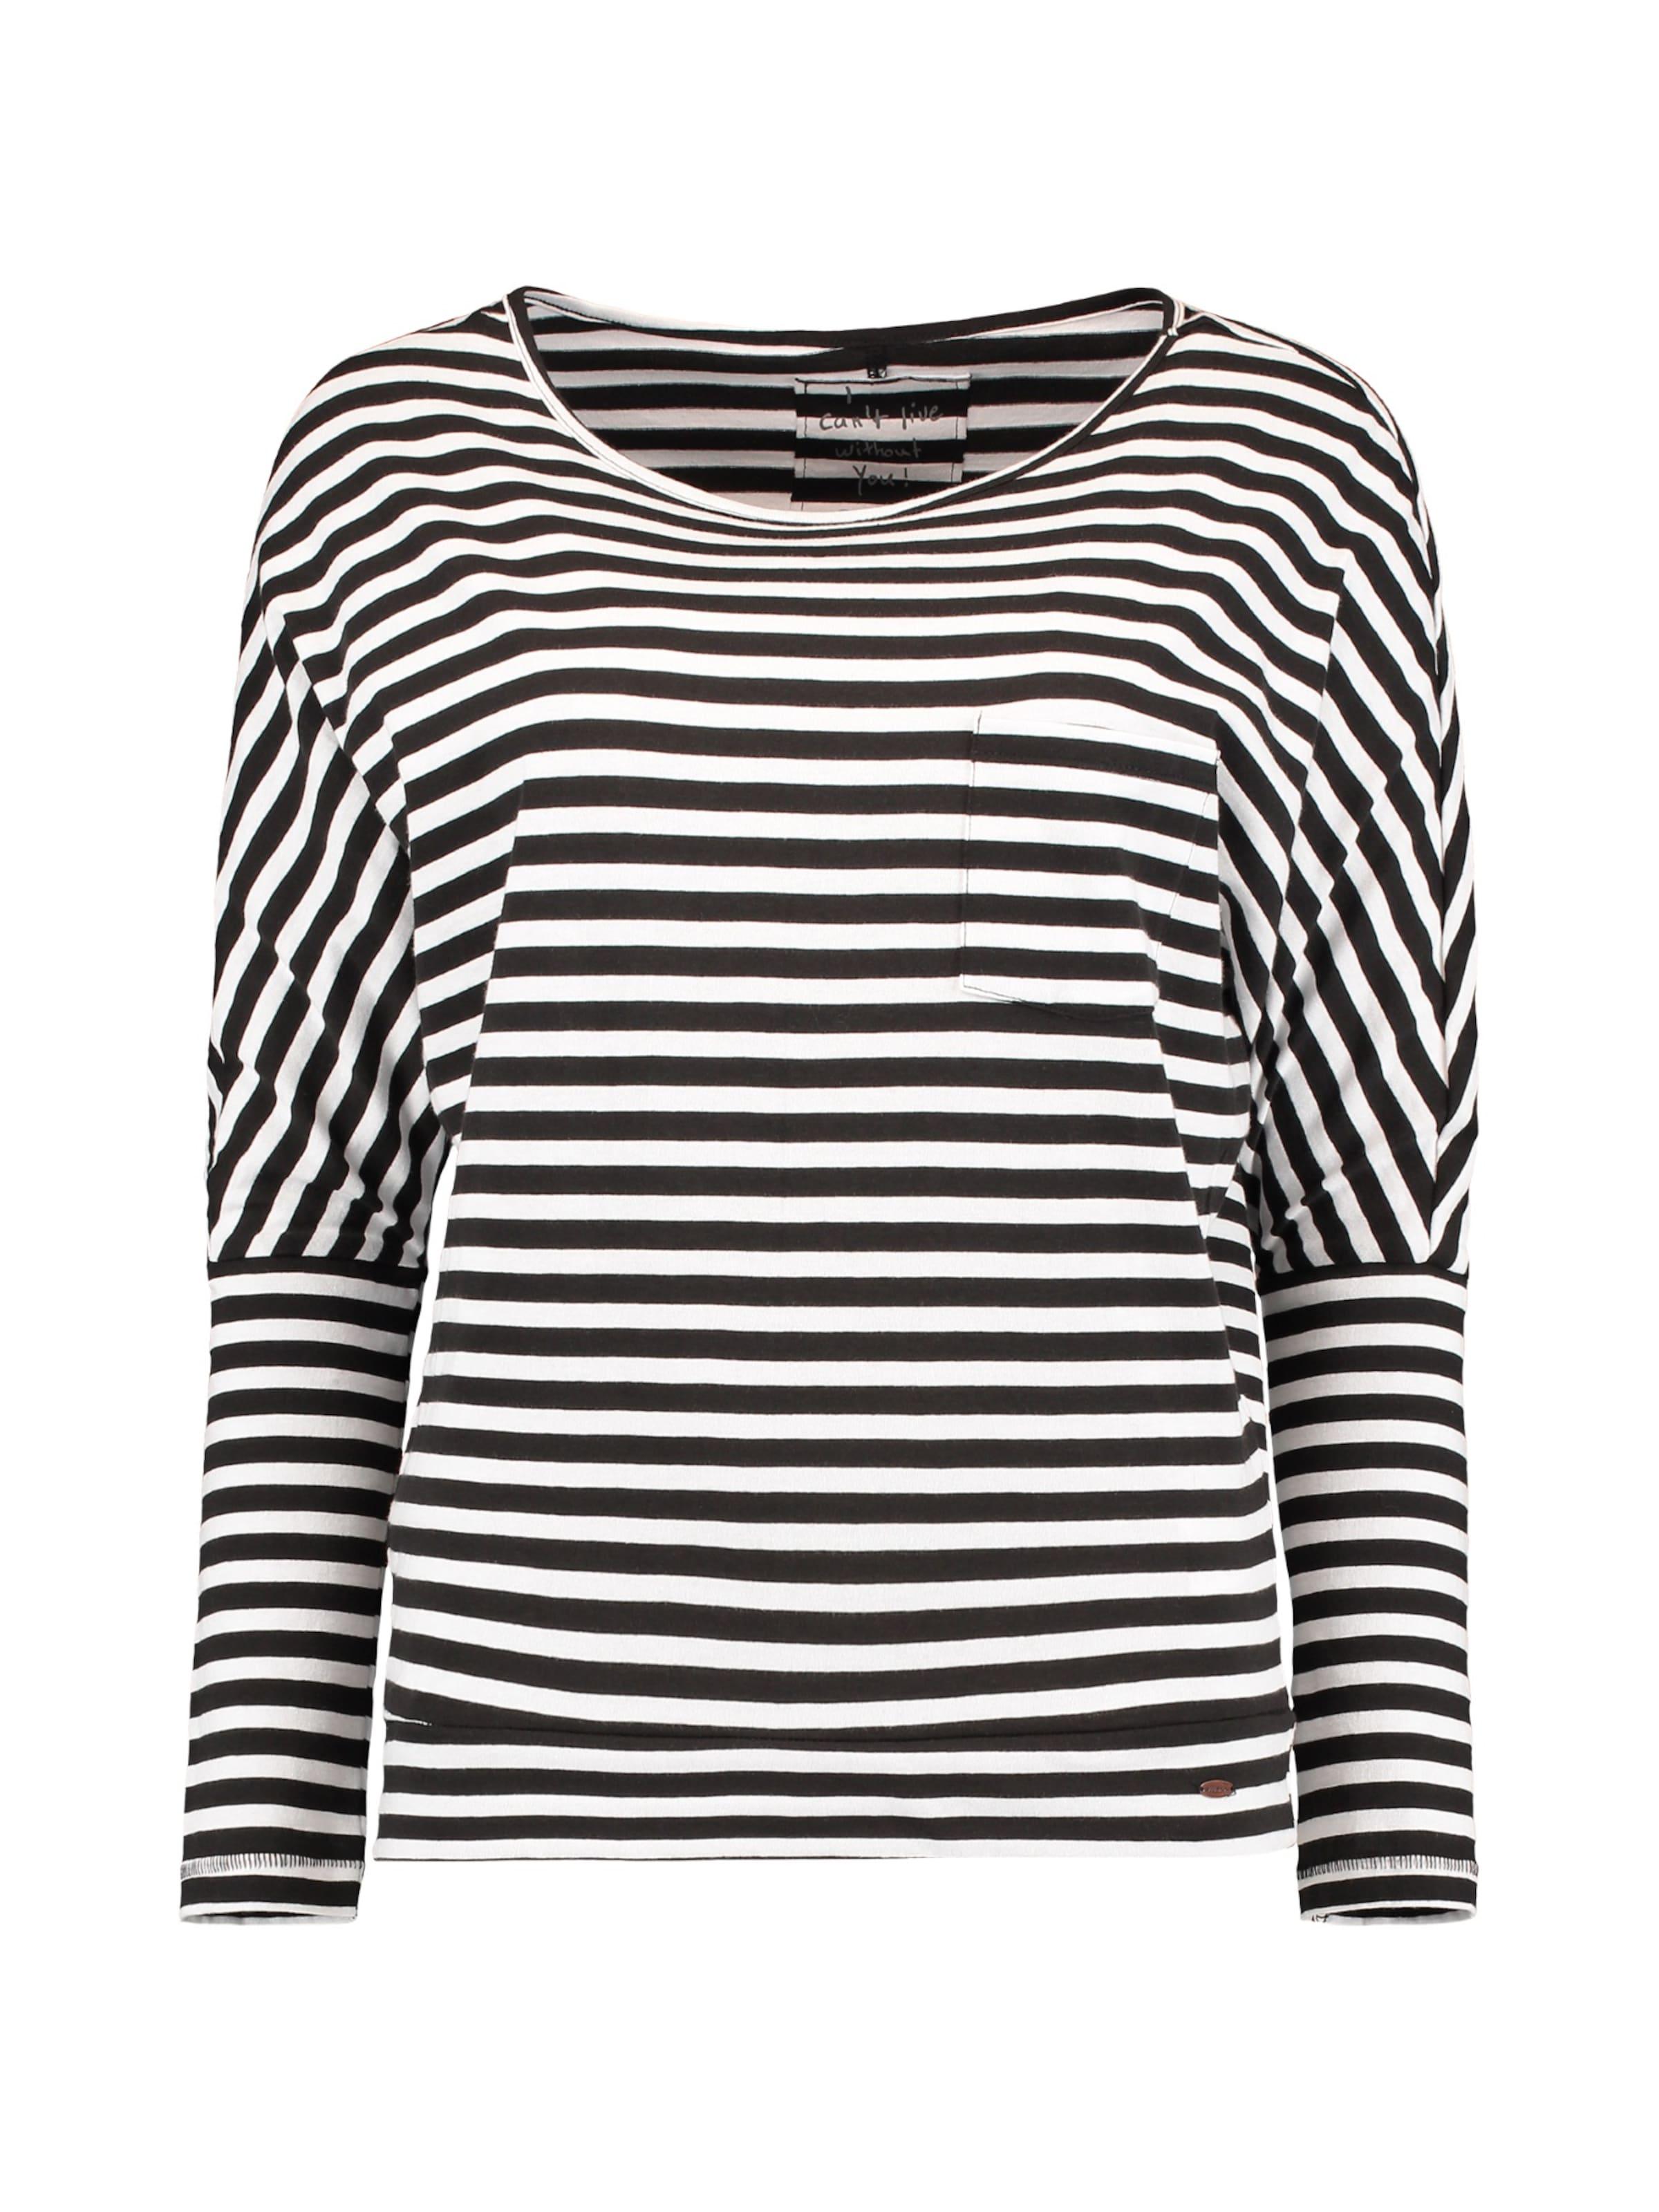 In Striped Shirt Top' SchwarzWeiß O'neill 'lw Essentials QrtdsCh